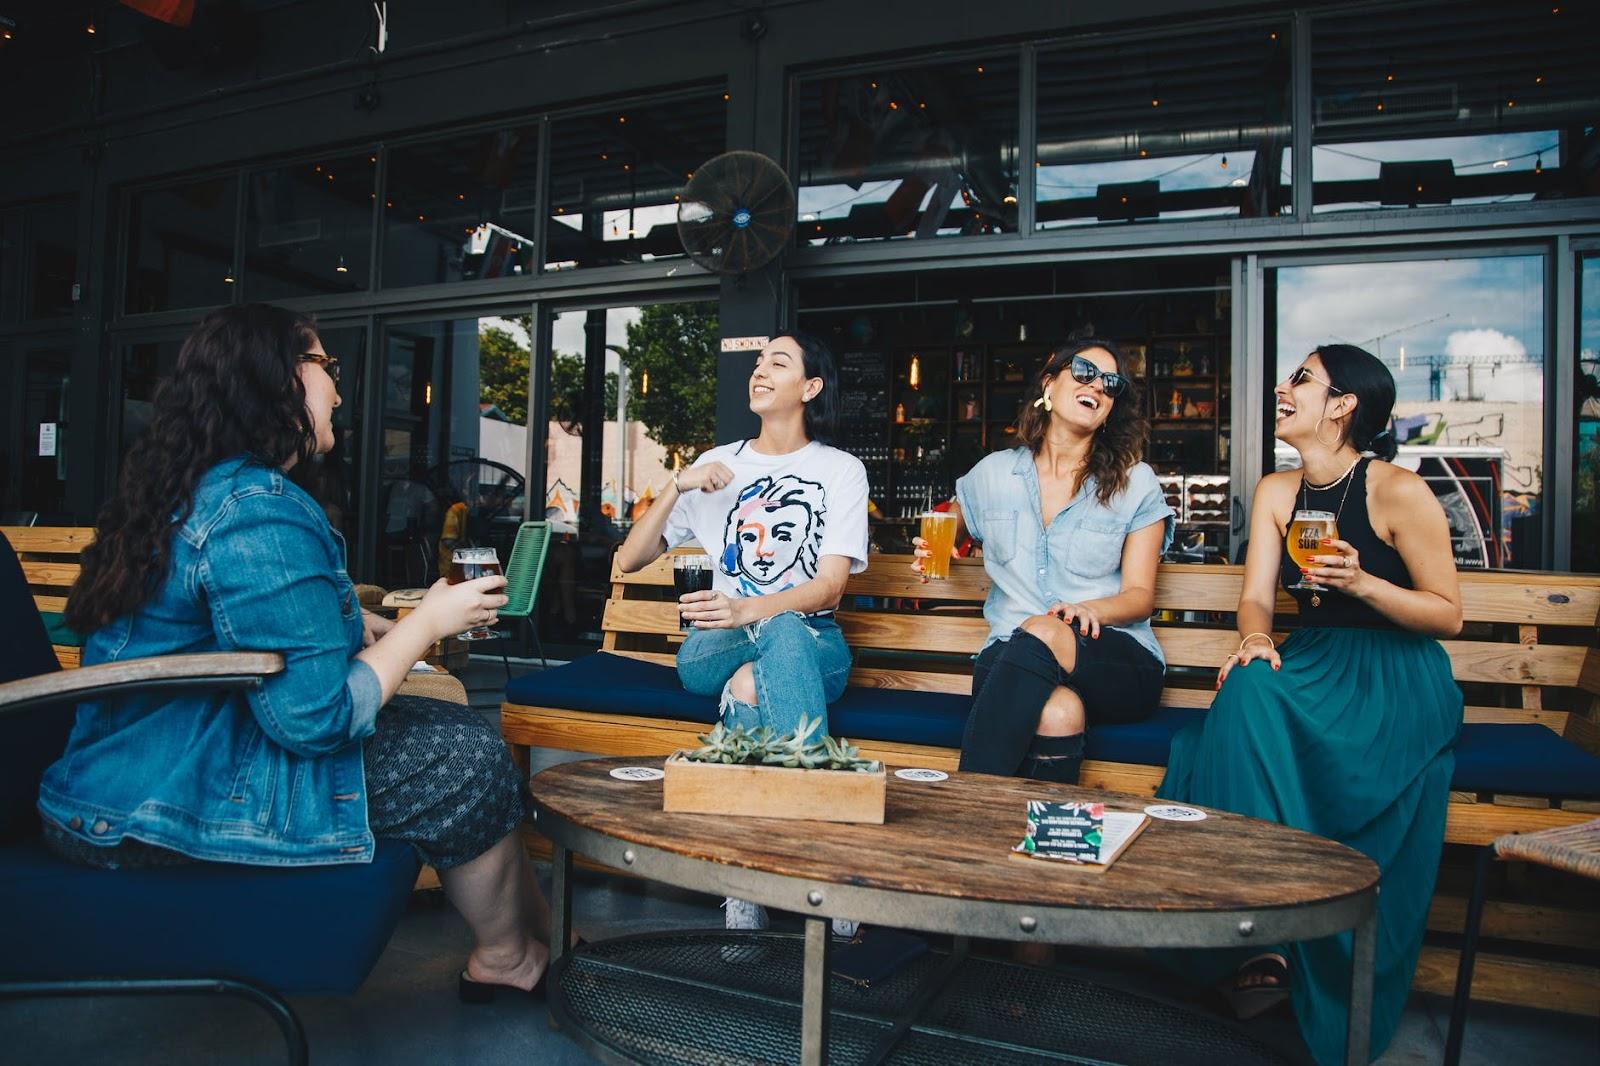 Four women gathered around a table talking